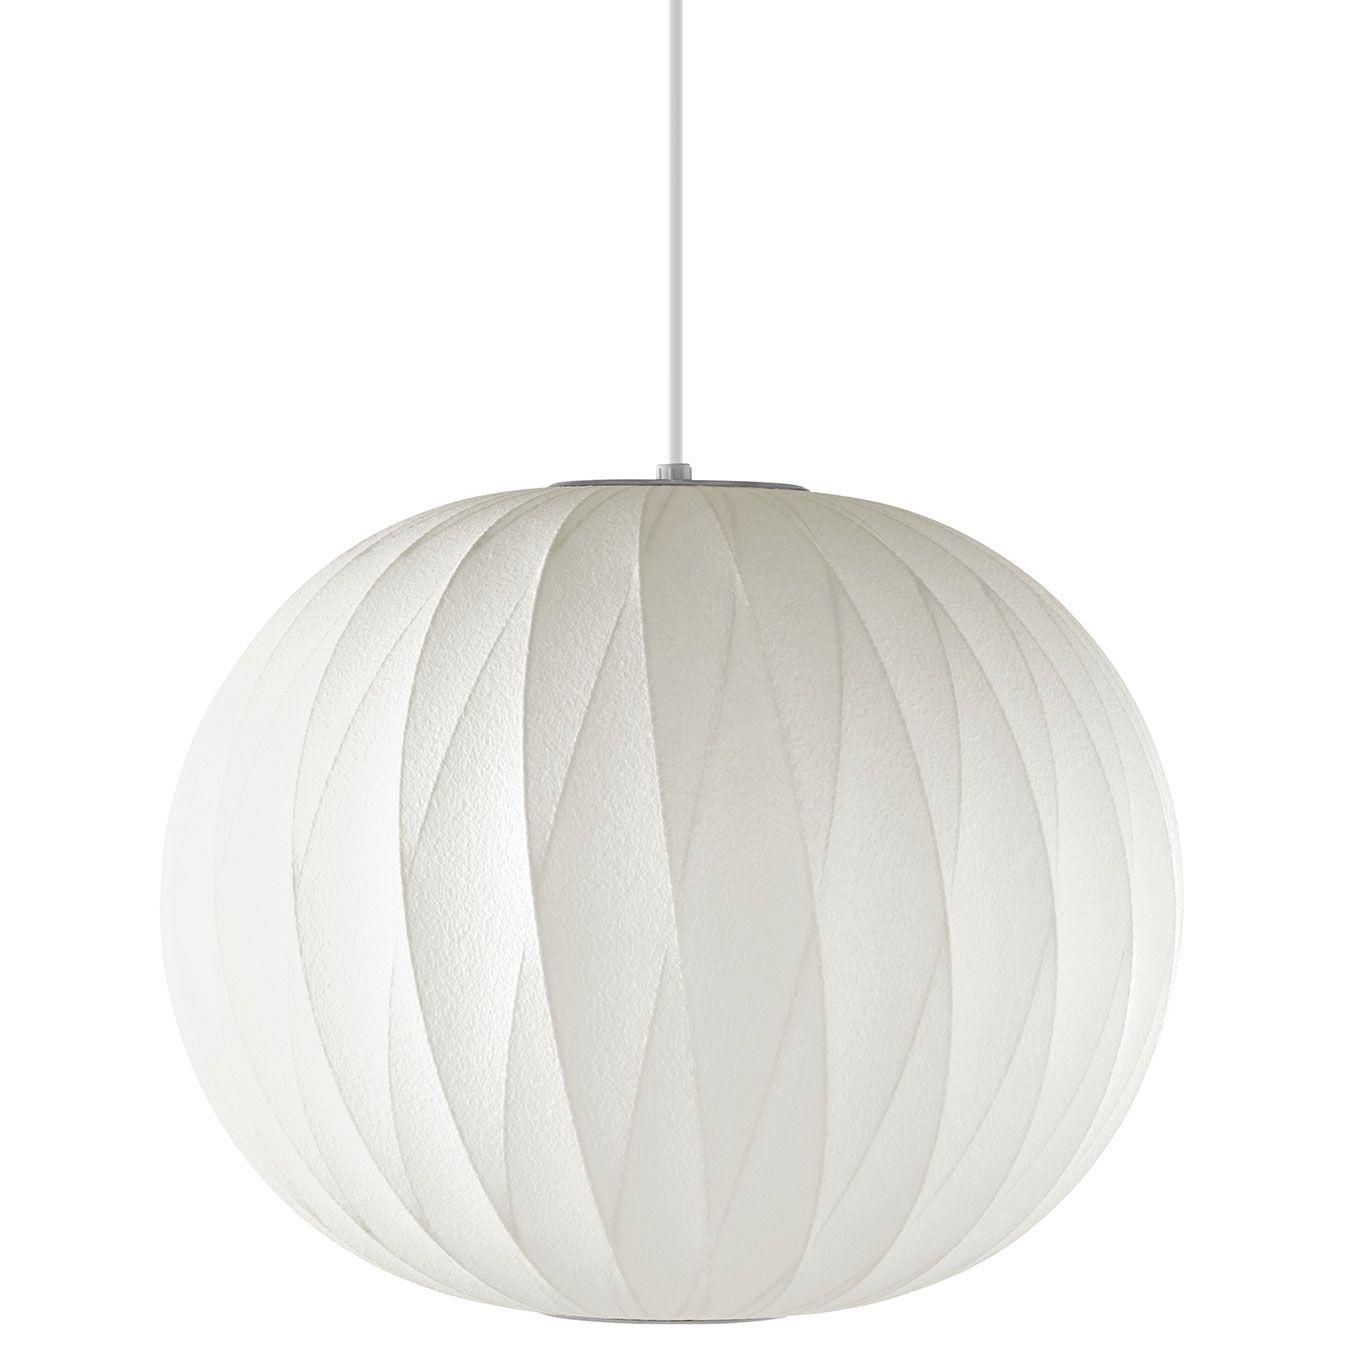 Ball Criss Cross Pendant by Nelson Bubble Lamps